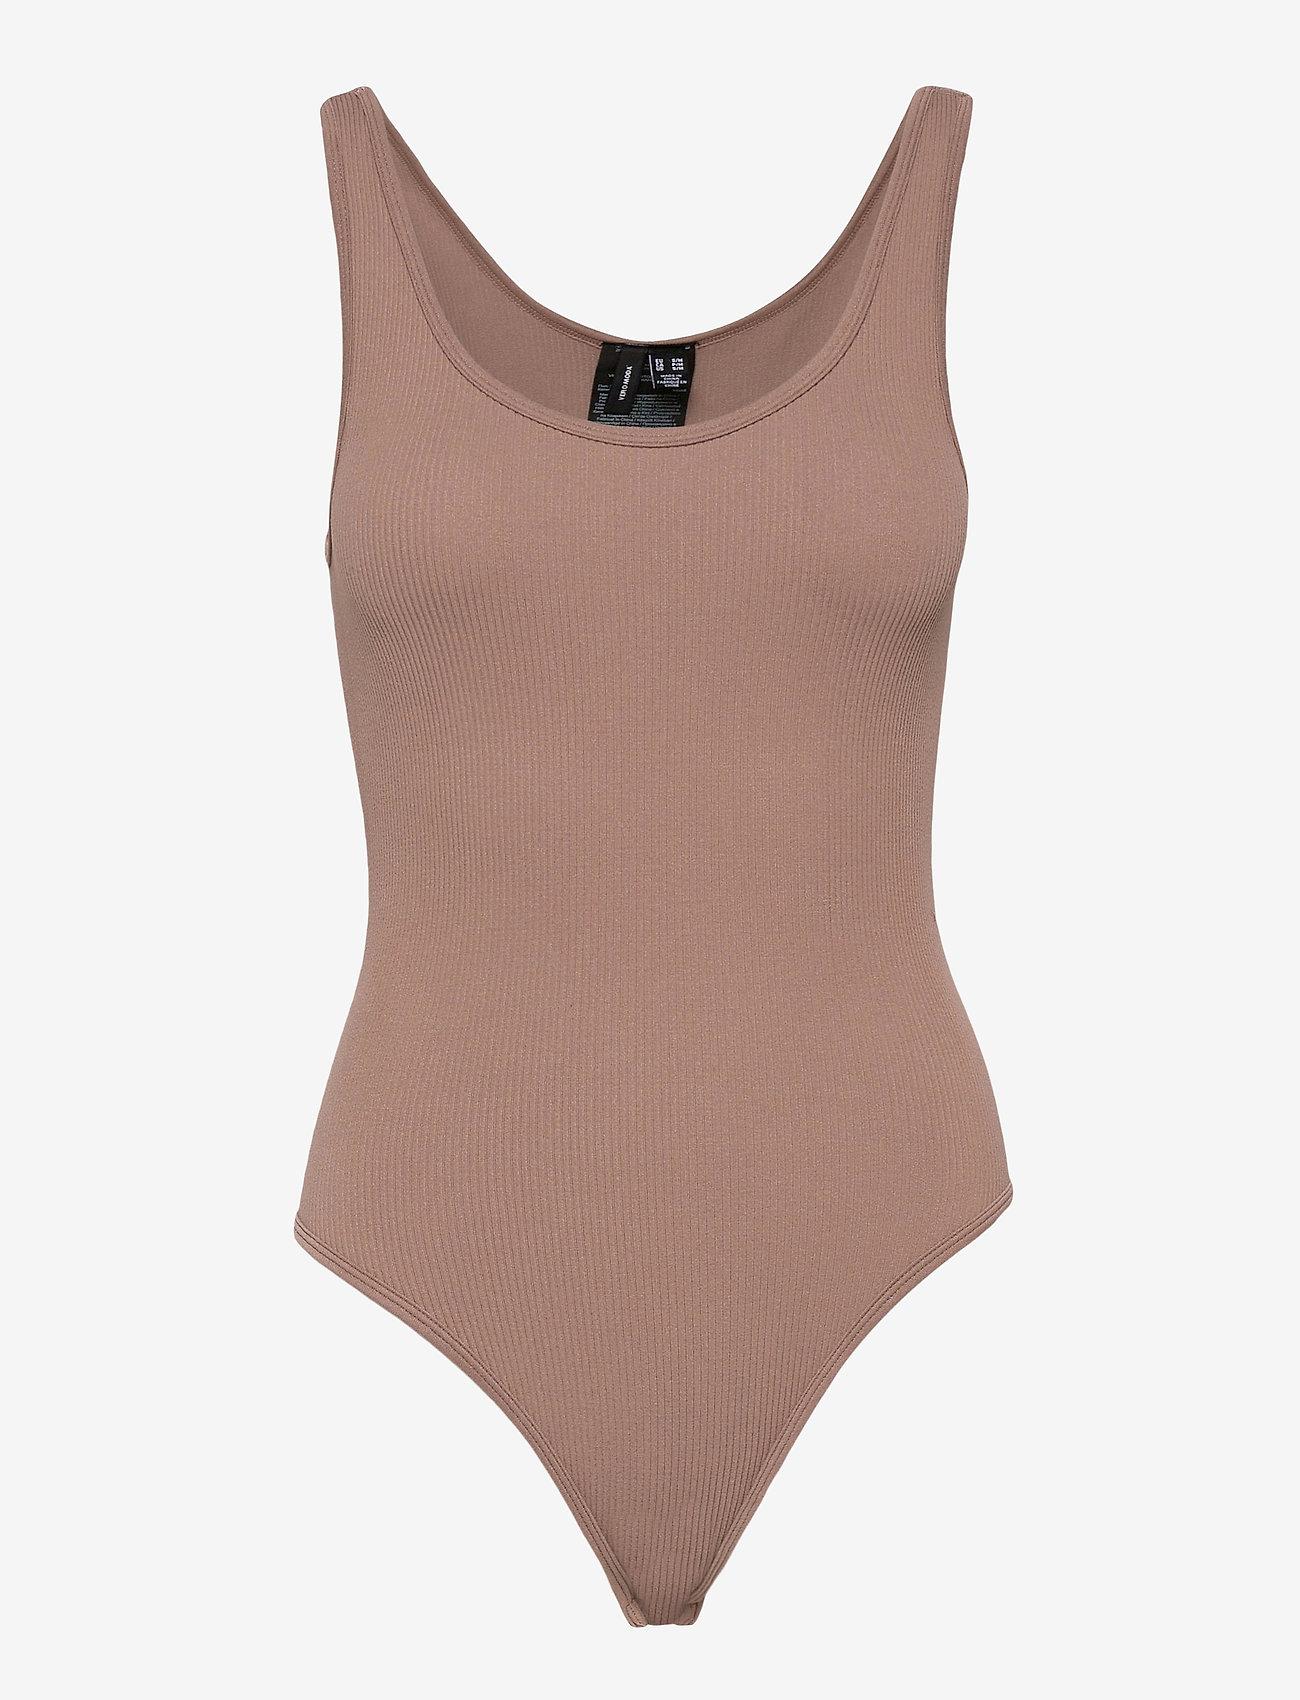 Vero Moda - VMEVE BODYSTOCKING - bodies - brownie - 0